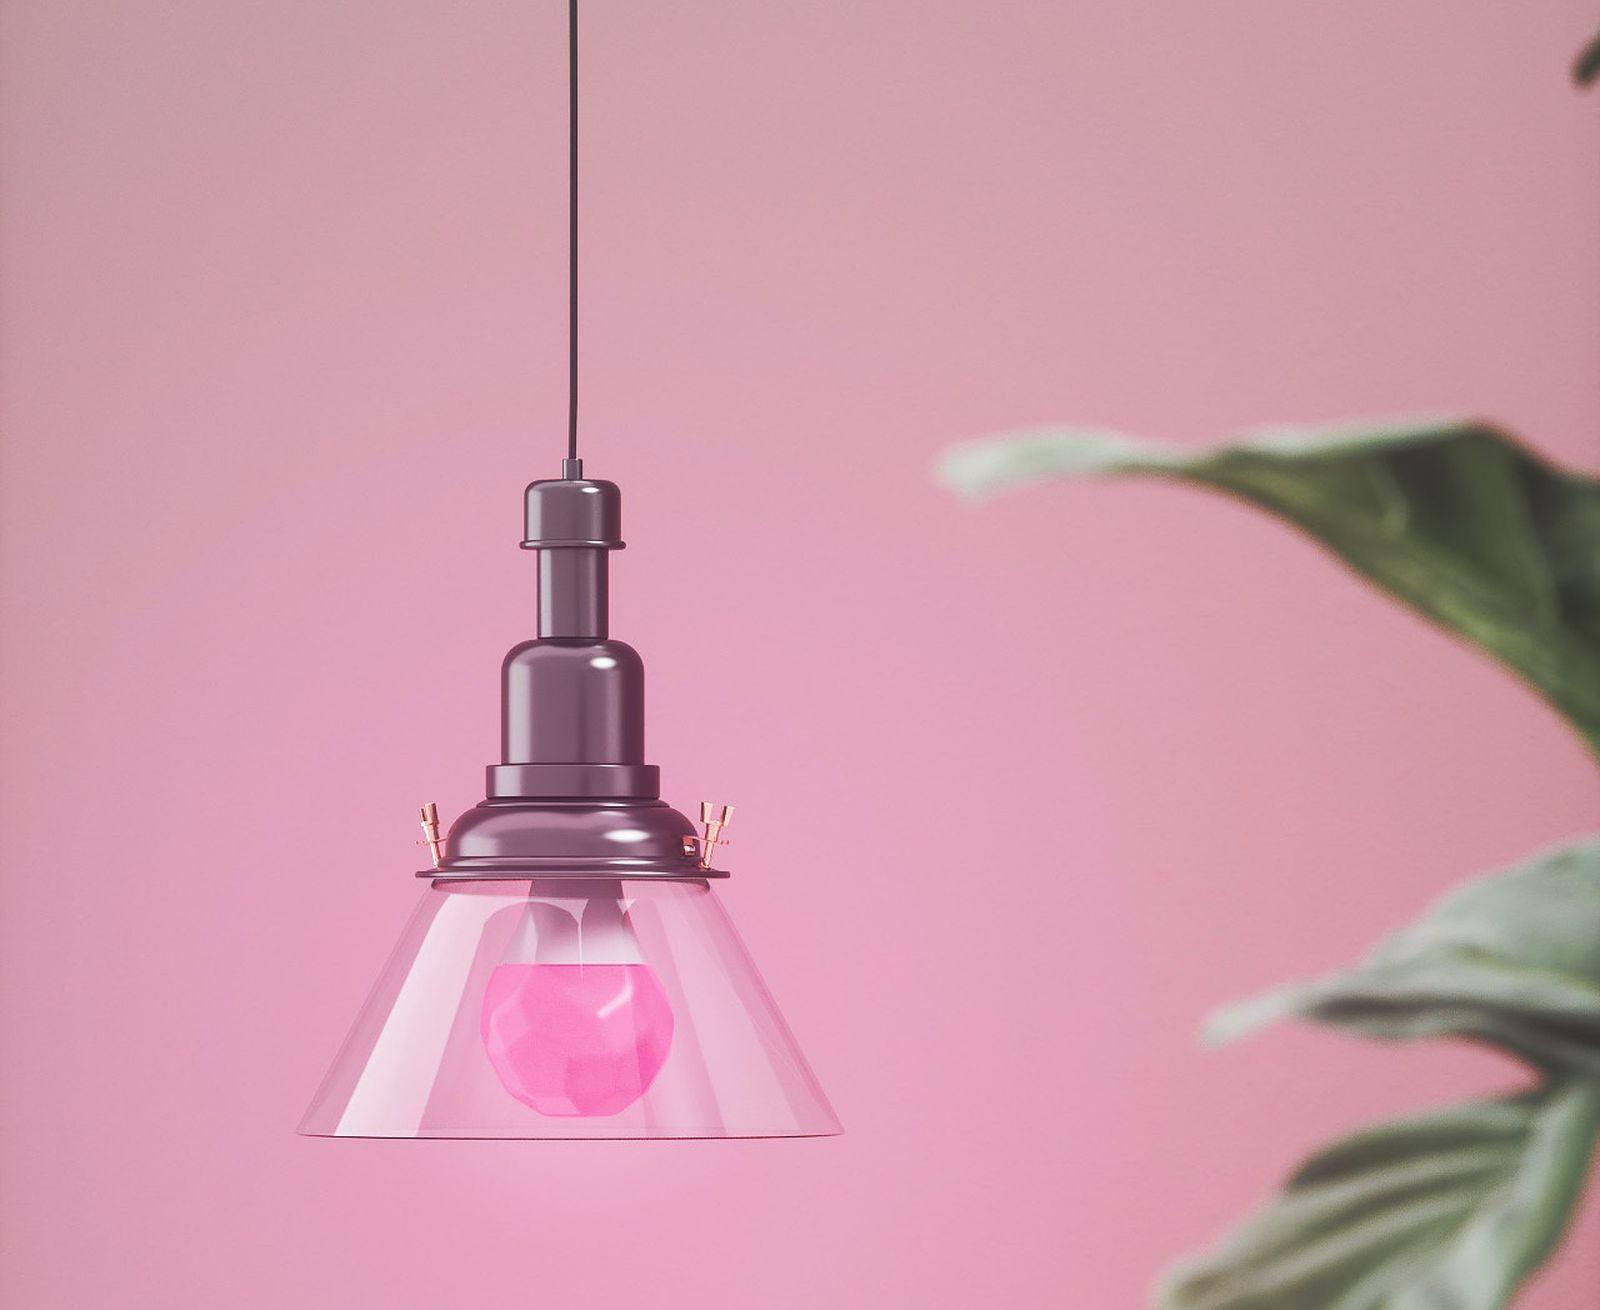 Nanoleaf Launches HomeKit-Compatible 'Essentials' LED Bulb and Lightstrip